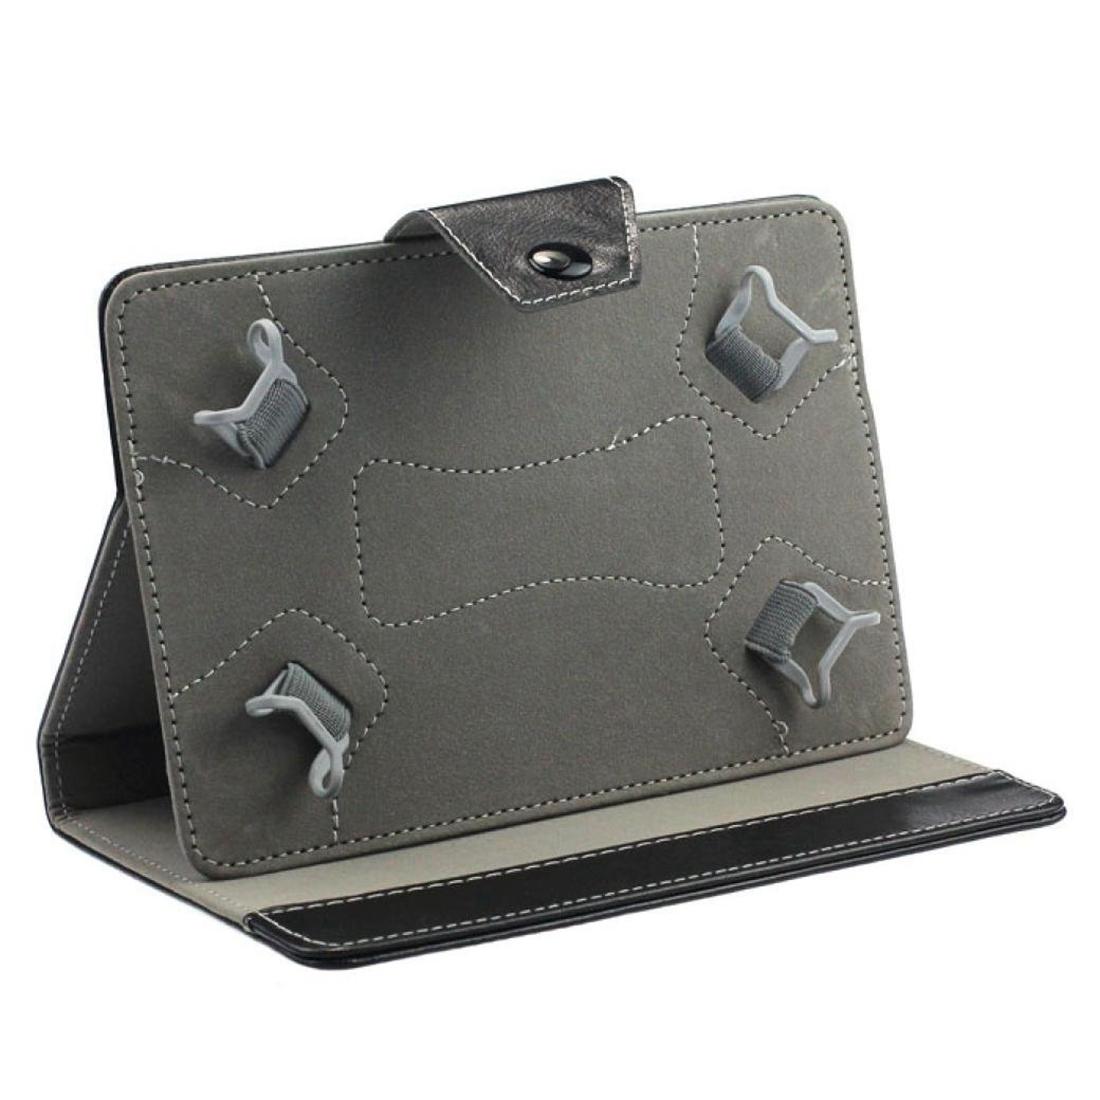 10 tablet pc abdeckung pu leder kristall gehaeuse unterstuetzung schwarz i2c6 ebay. Black Bedroom Furniture Sets. Home Design Ideas